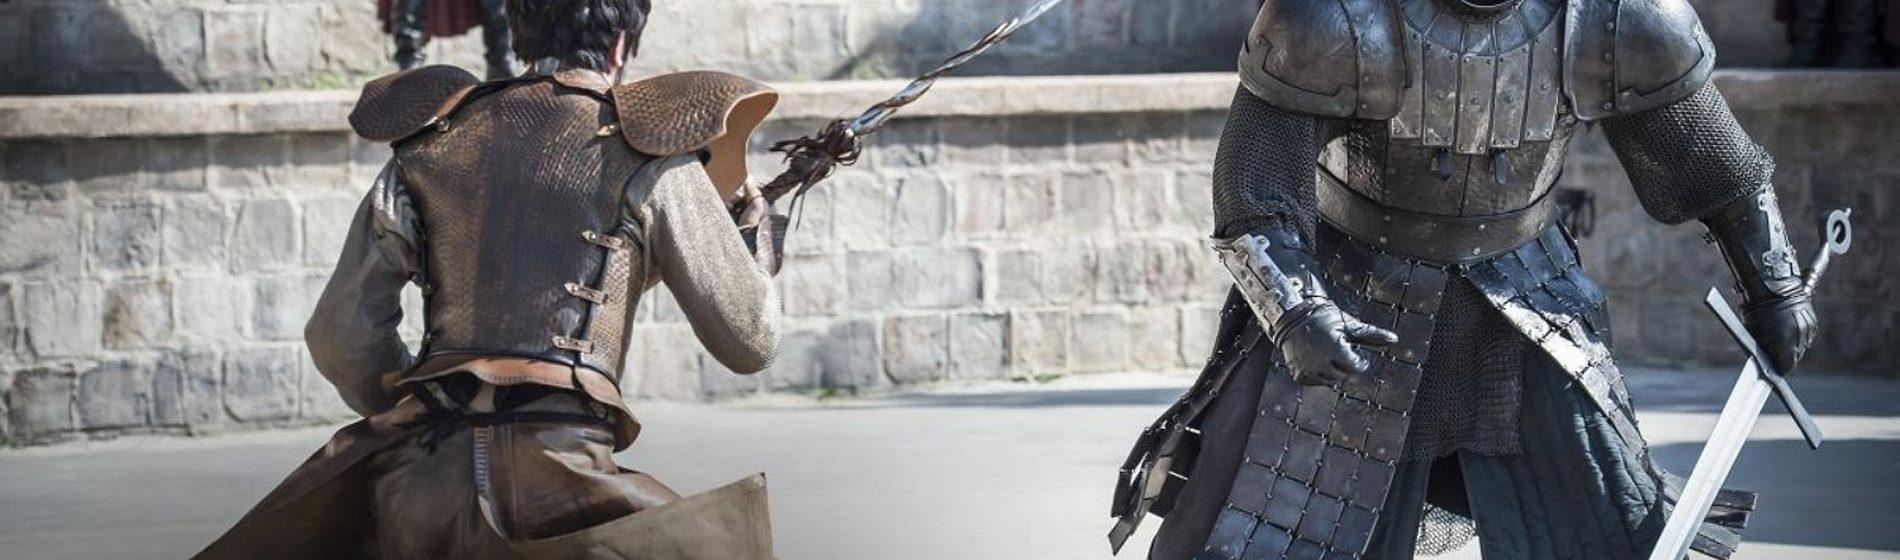 Game of Thrones - Season 4 Episode 8 - Viper-and-Mountain